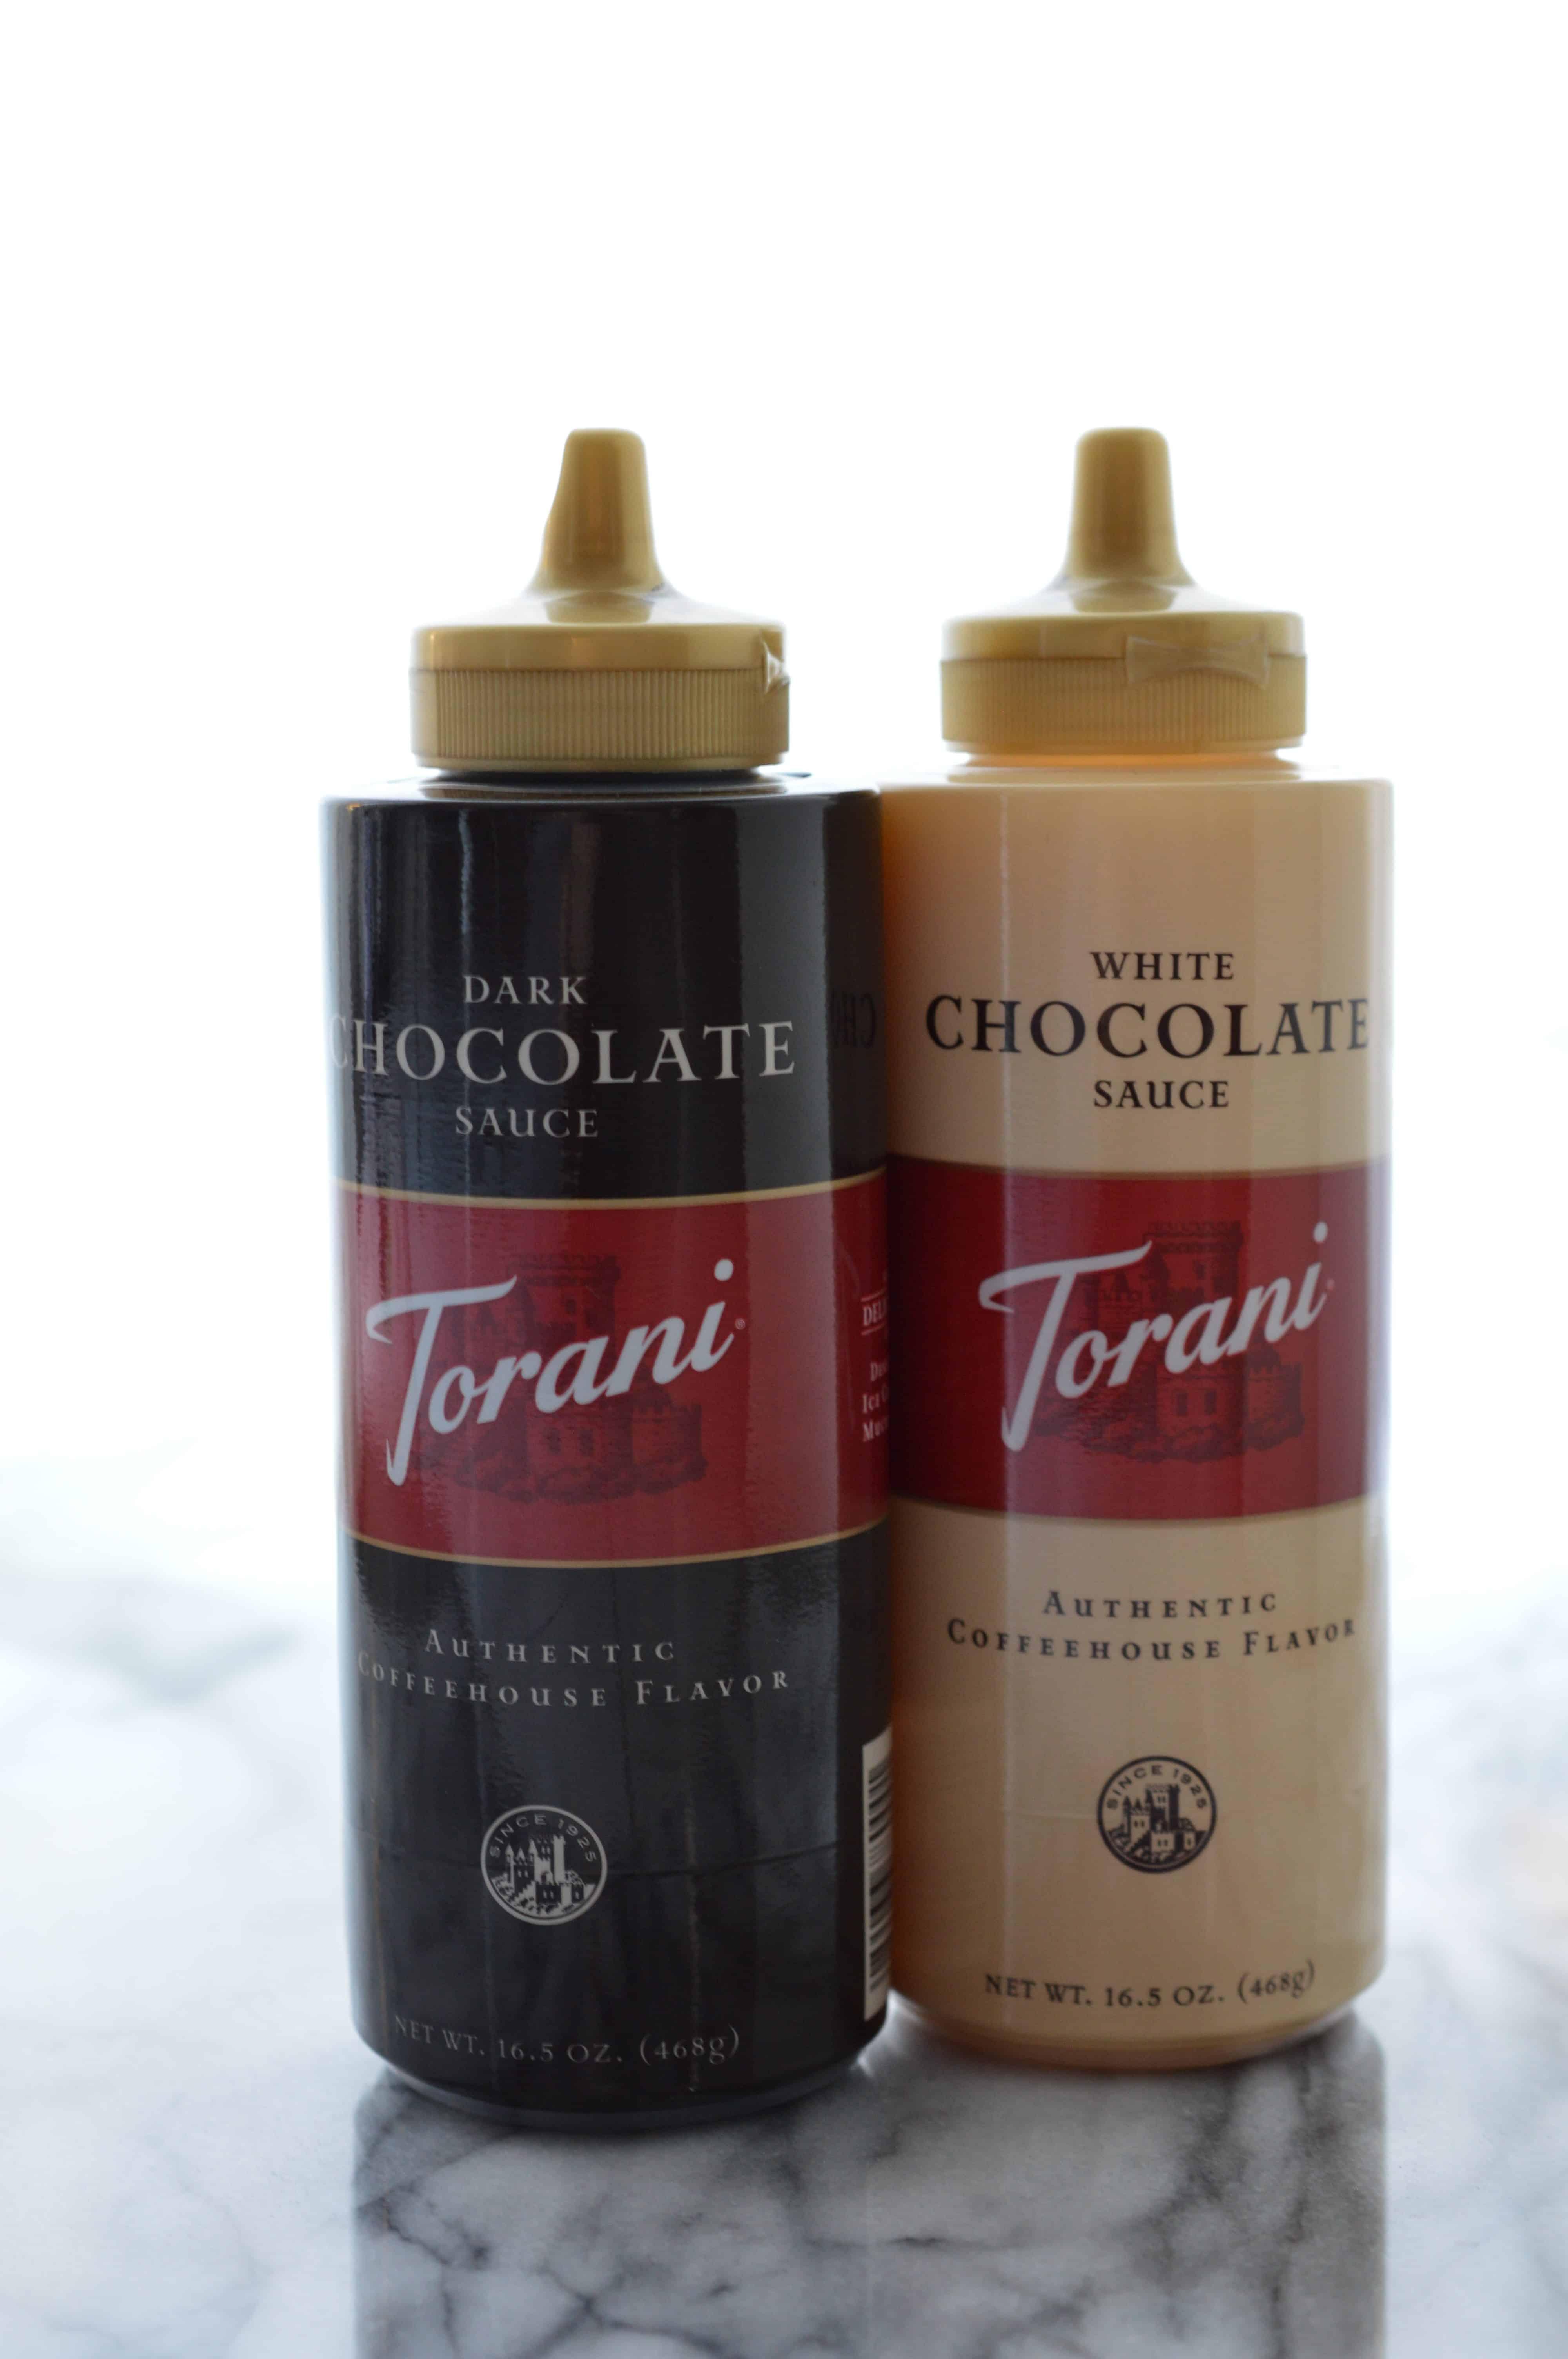 Torani Dark and White Chocolate Sauces in bottles.